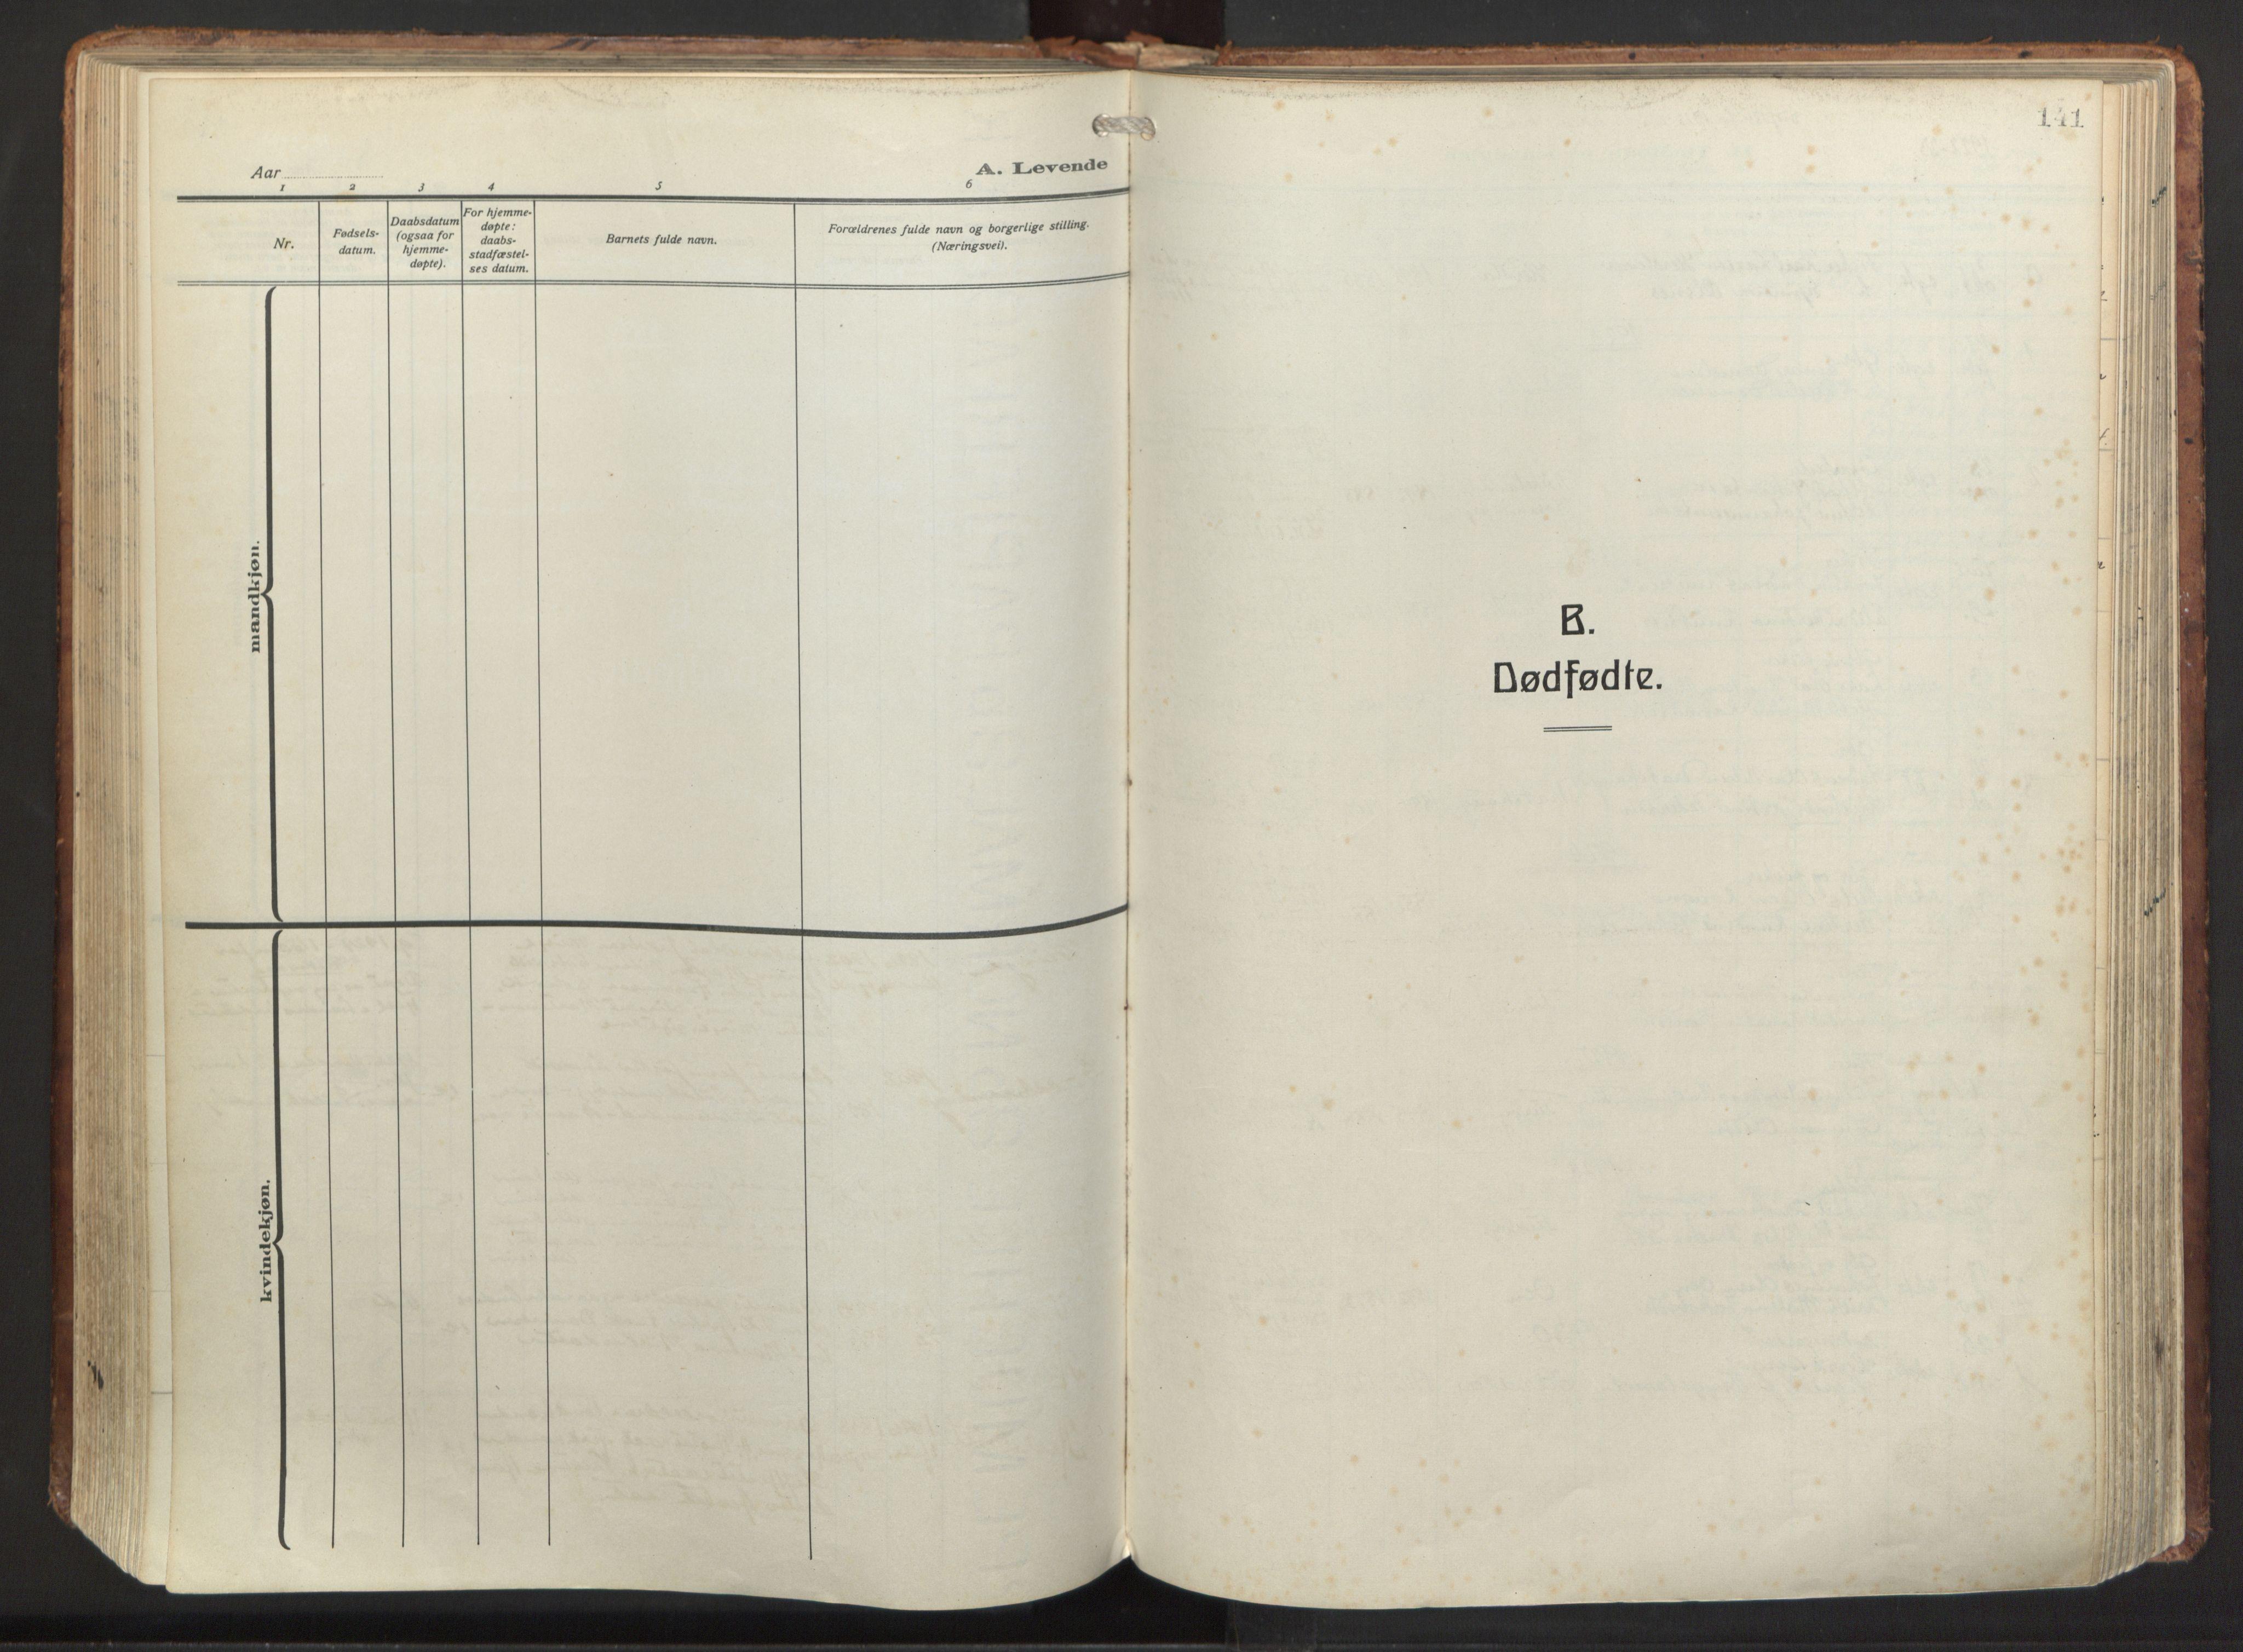 SAB, Herdla Sokneprestembete, H/Haa: Ministerialbok nr. A 6, 1918-1933, s. 141